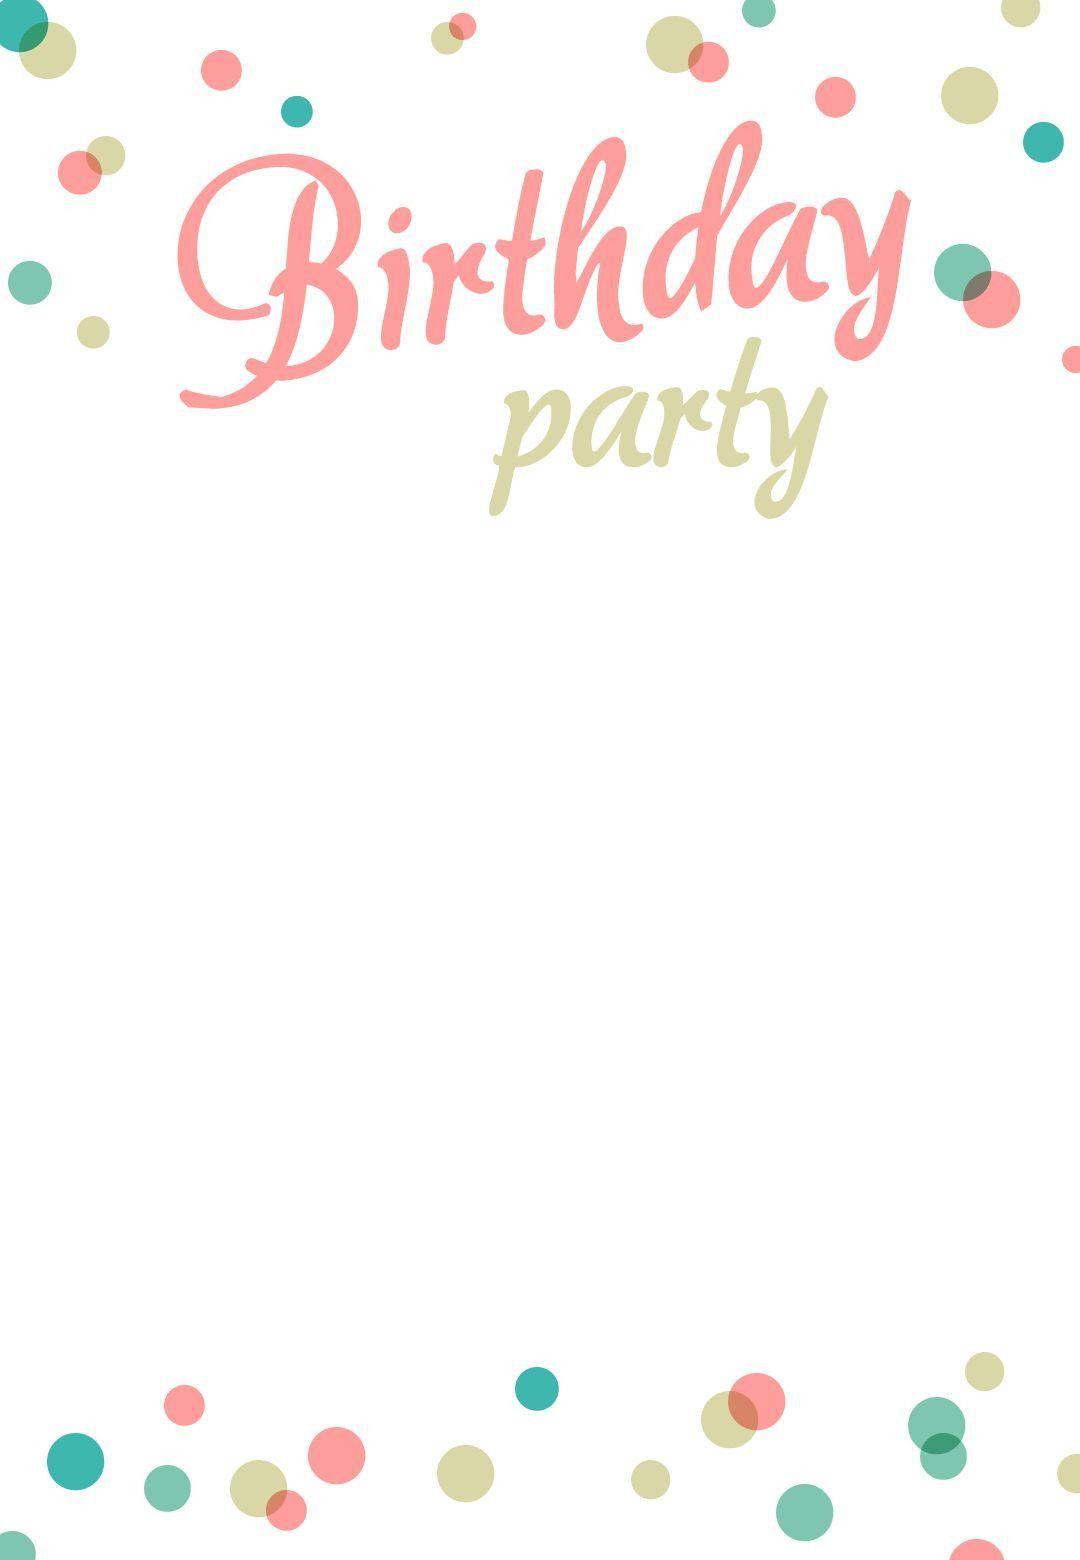 000 Fascinating Free Birthday Party Invitation Template High Definition  Templates Printable 16th Australia UkFull